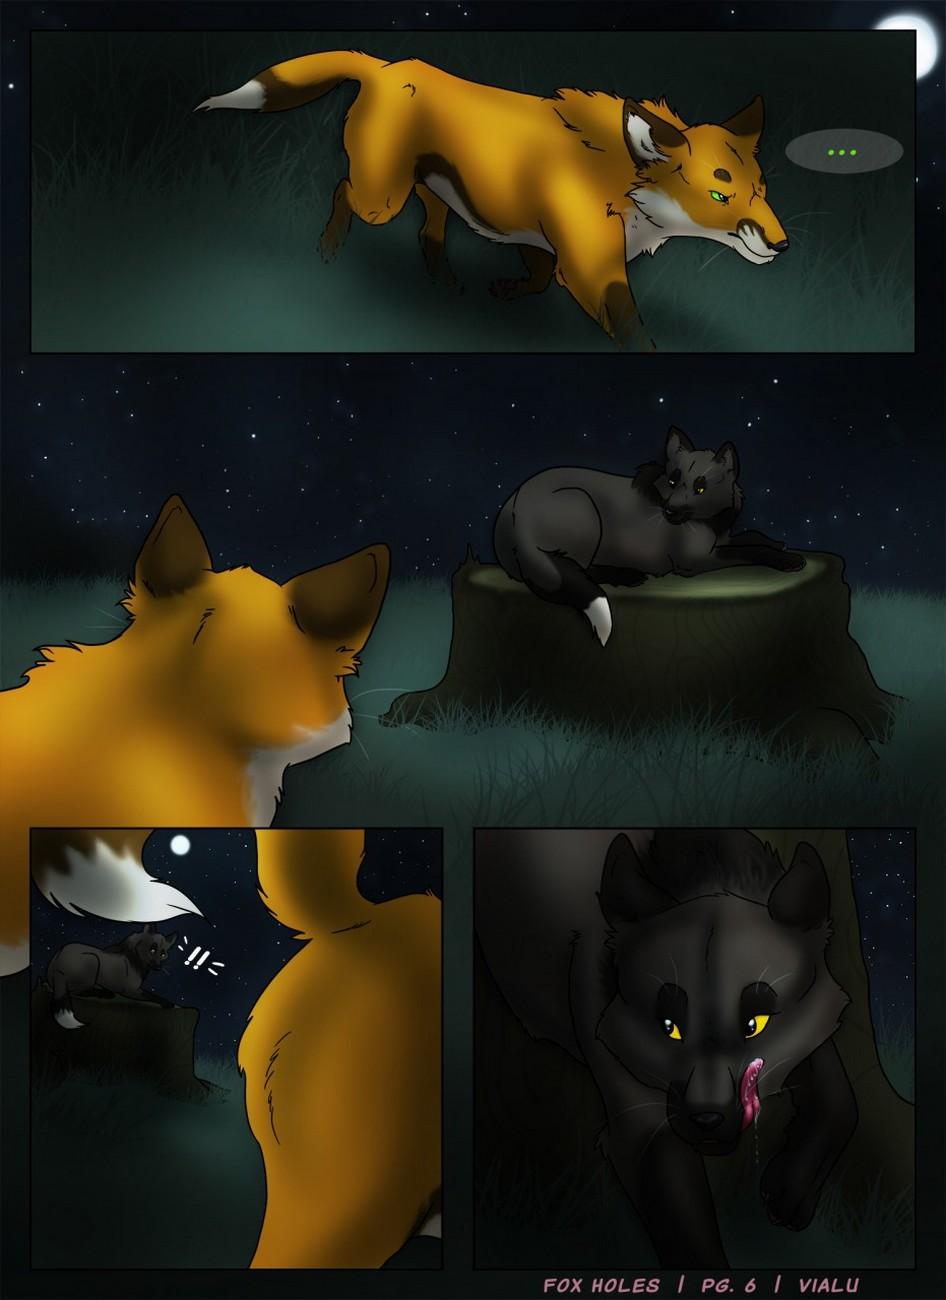 Fox Holes gay furry comic